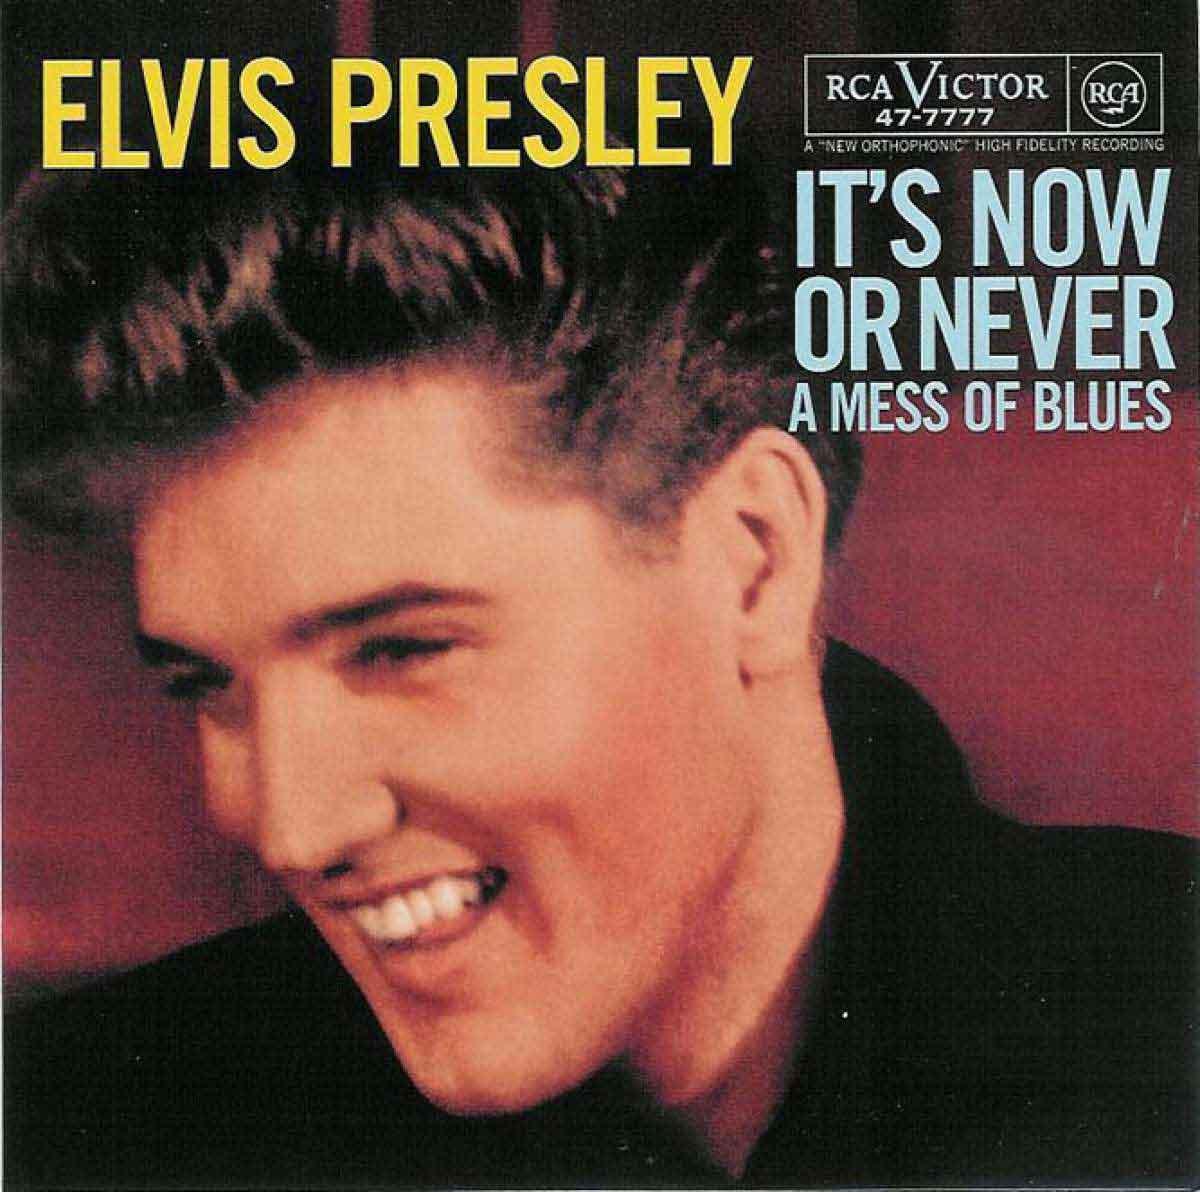 En İyi Fon Müzikleri Elvis Presley - It's Now or Never